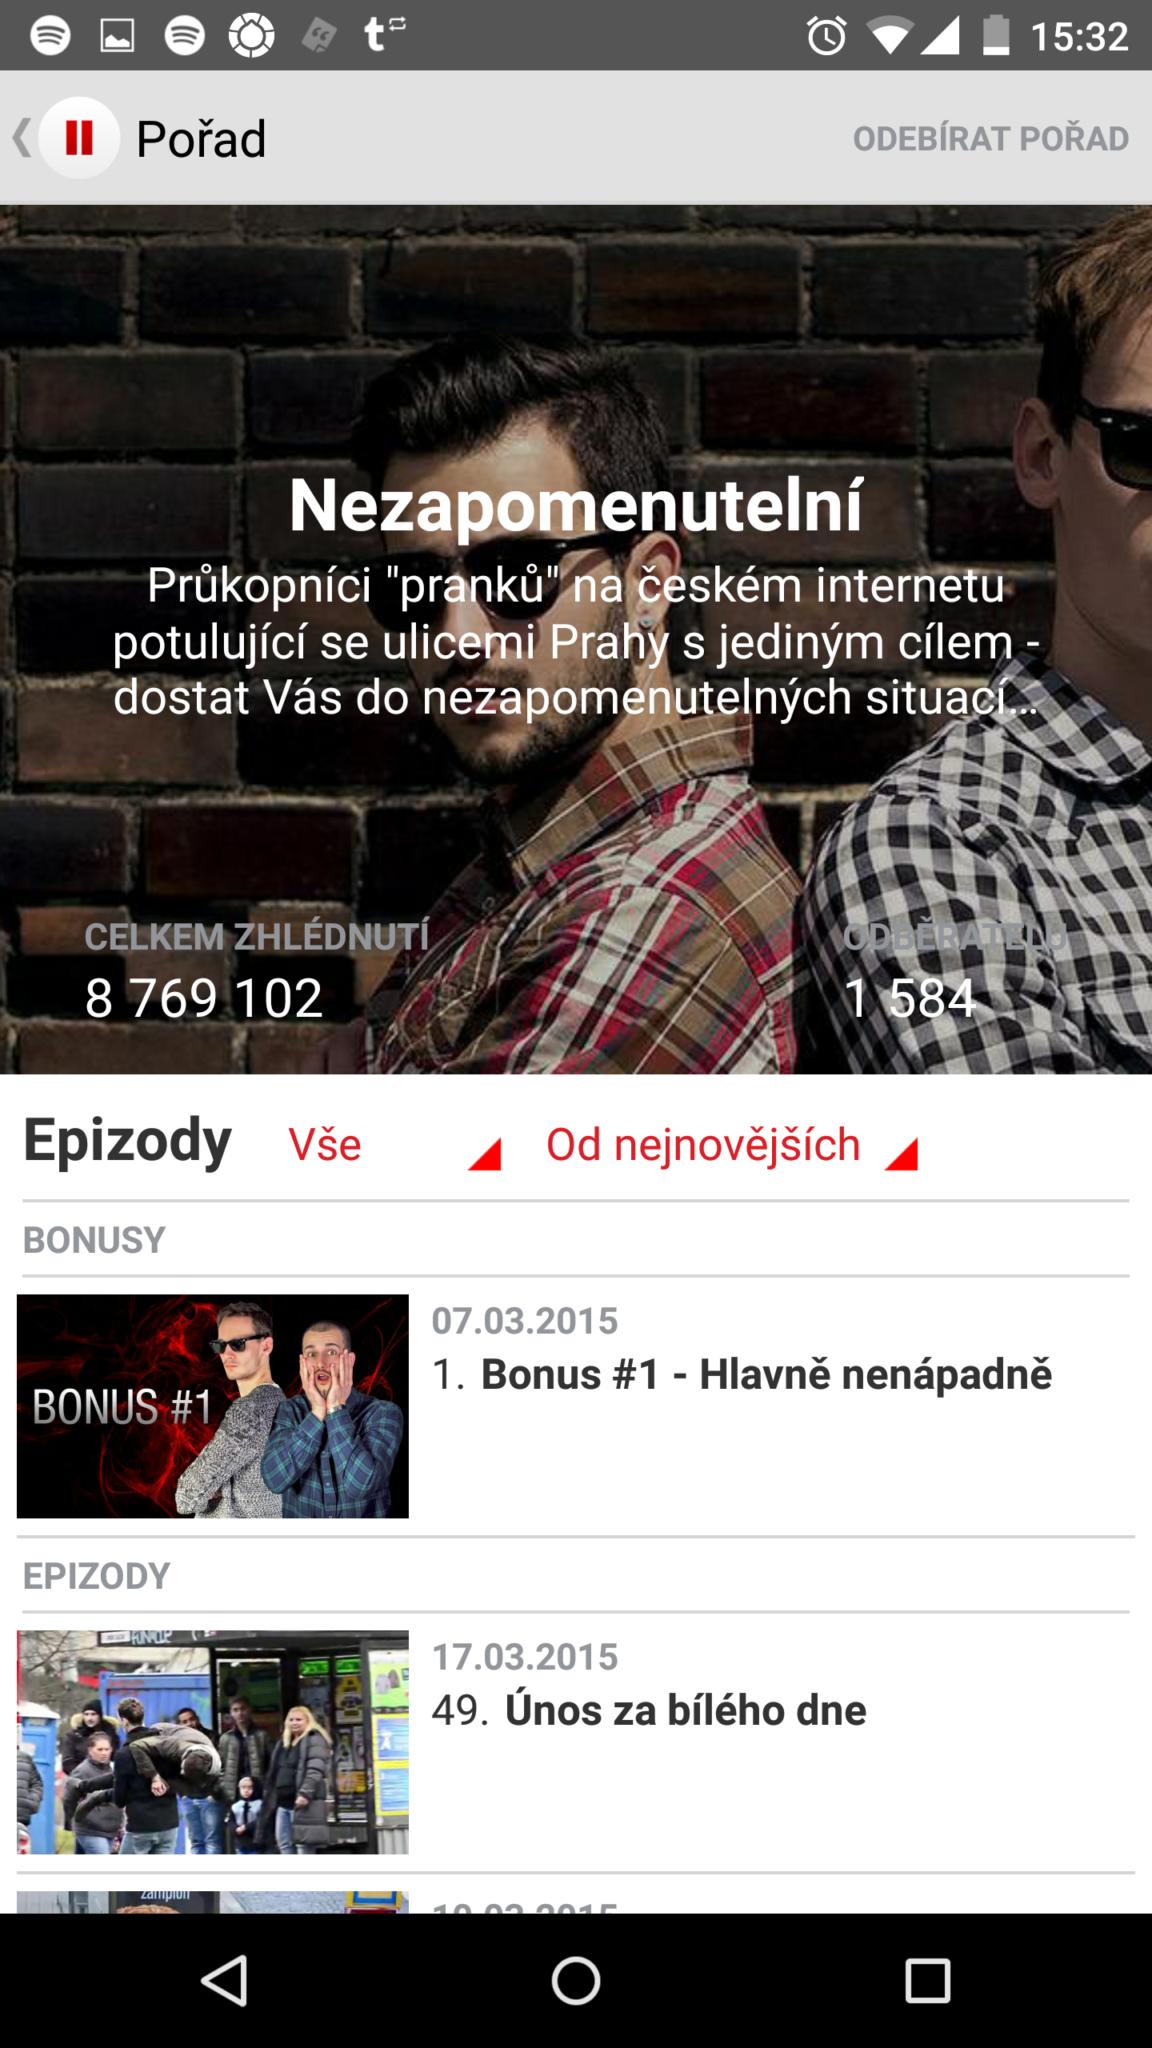 Stream.cz pro Android ve verzi 2.0